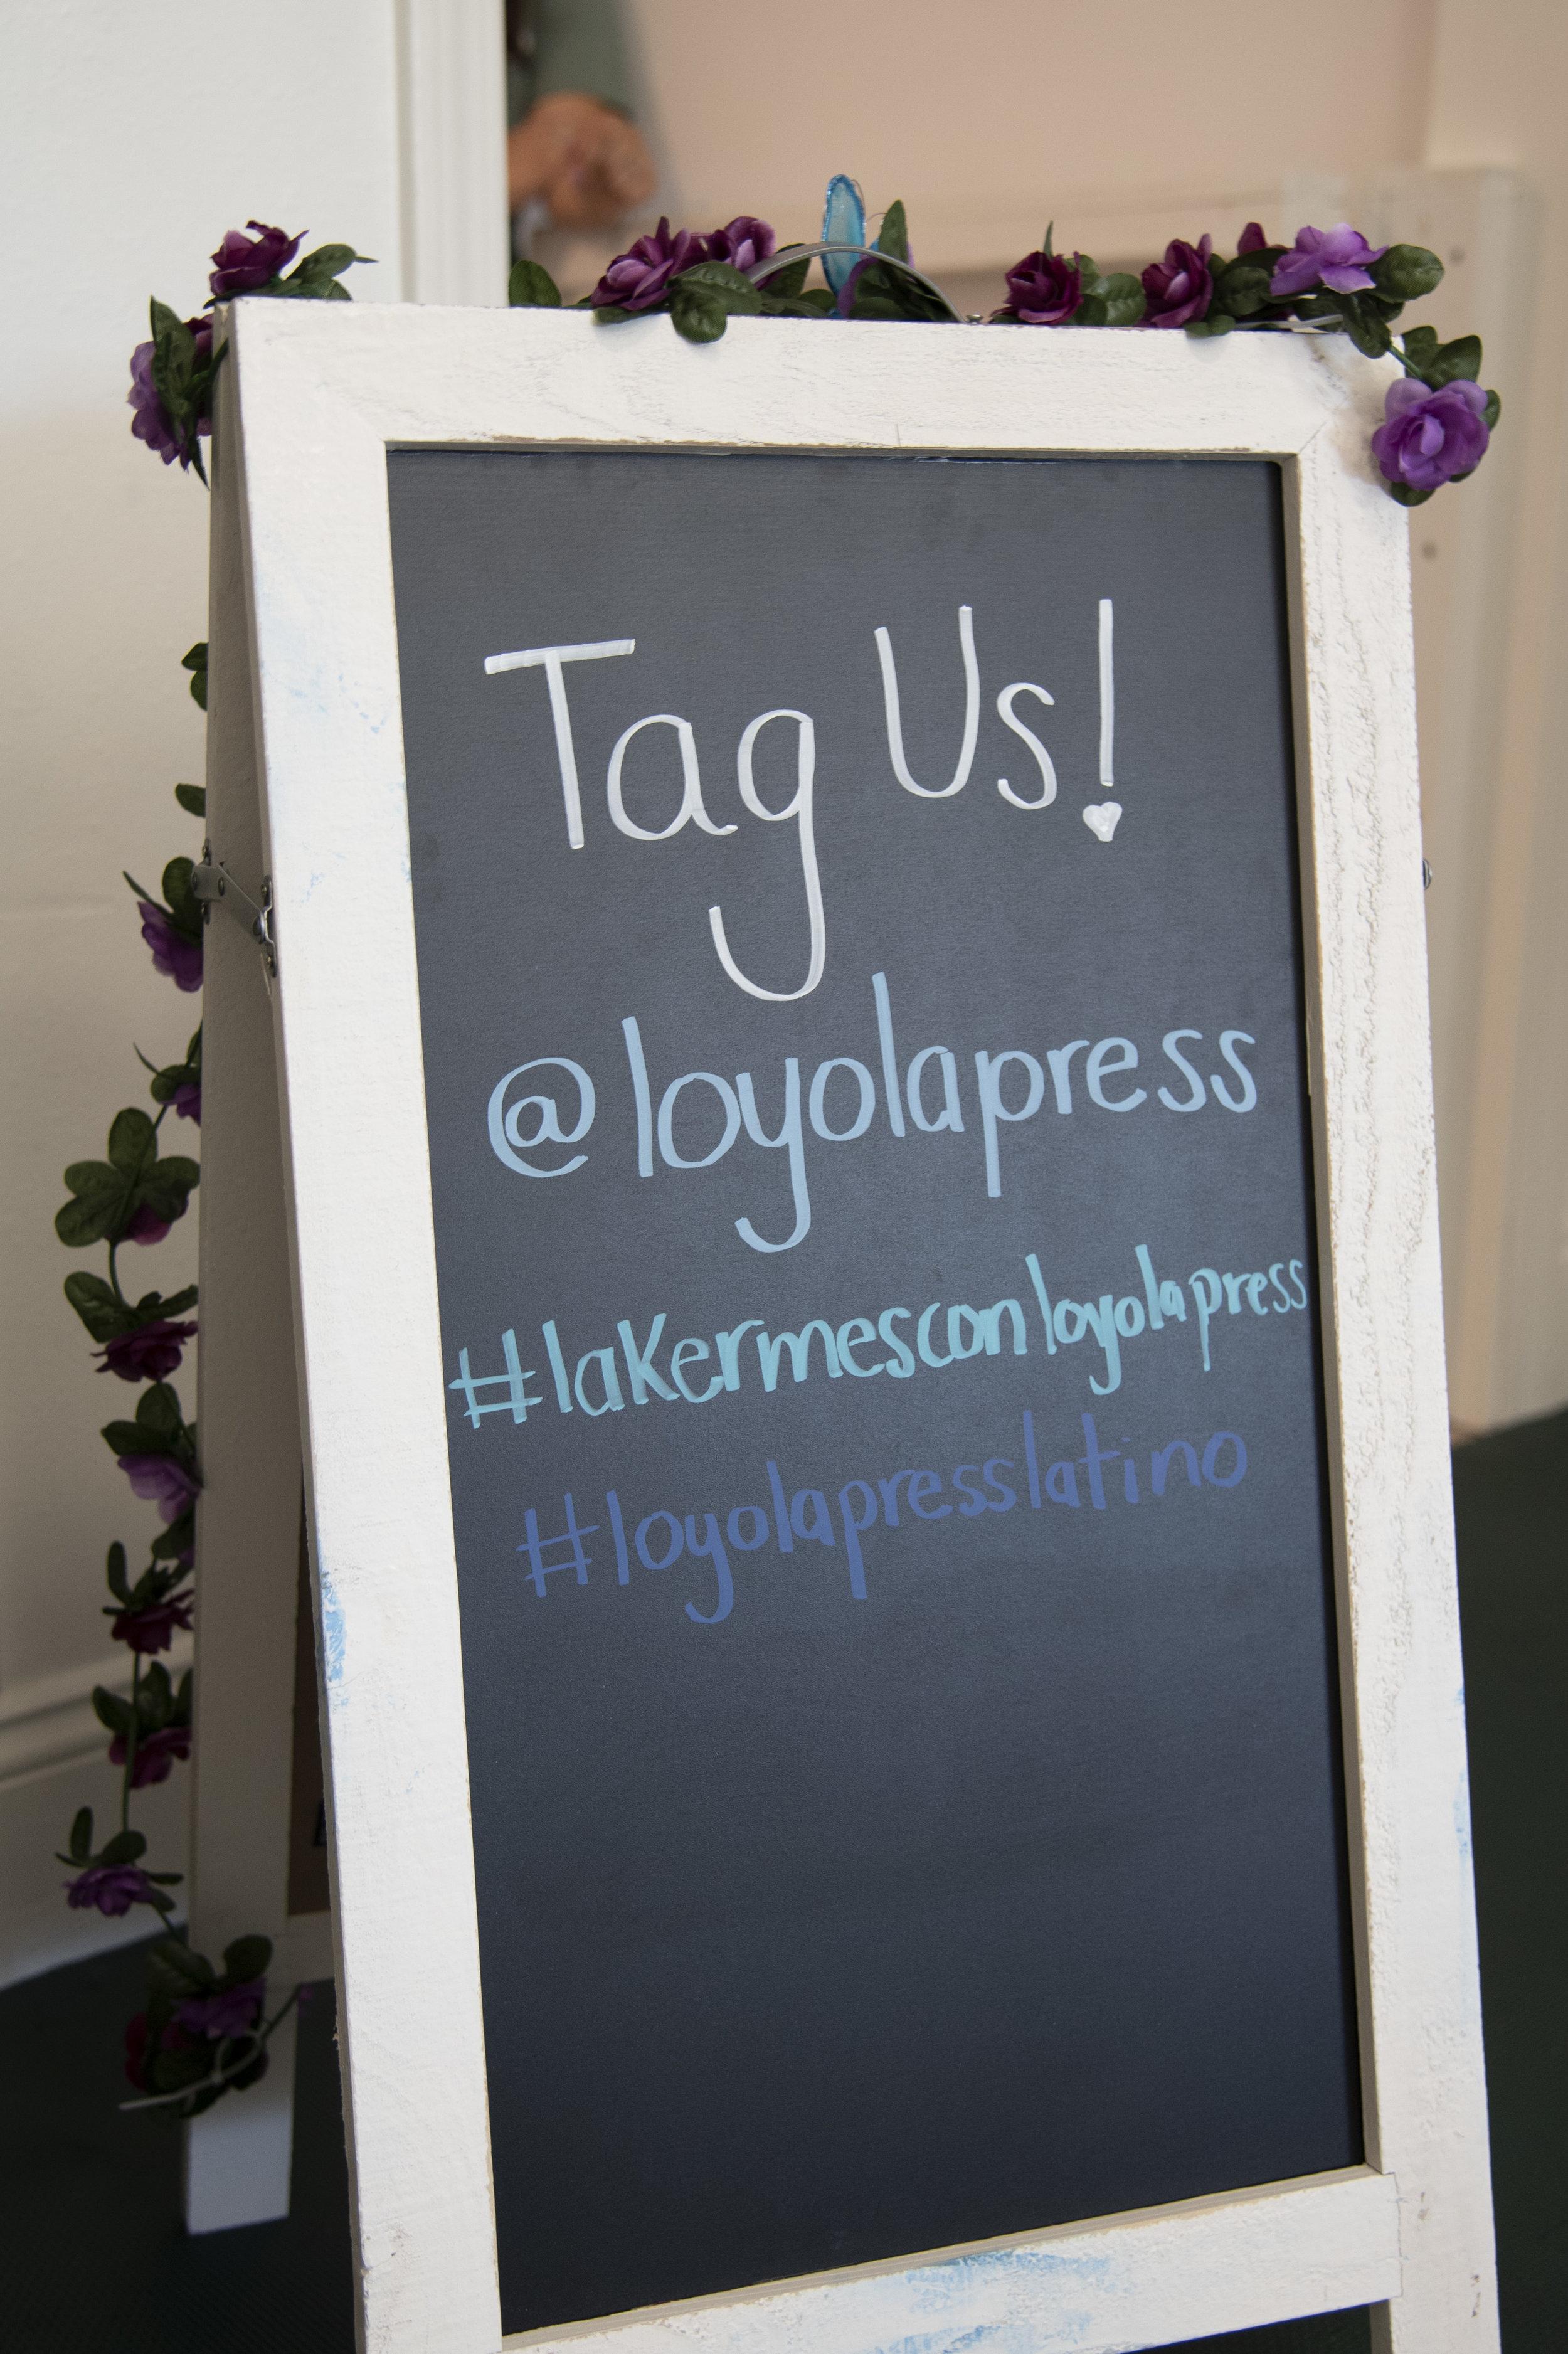 LoyolaPress_186 (1).jpg